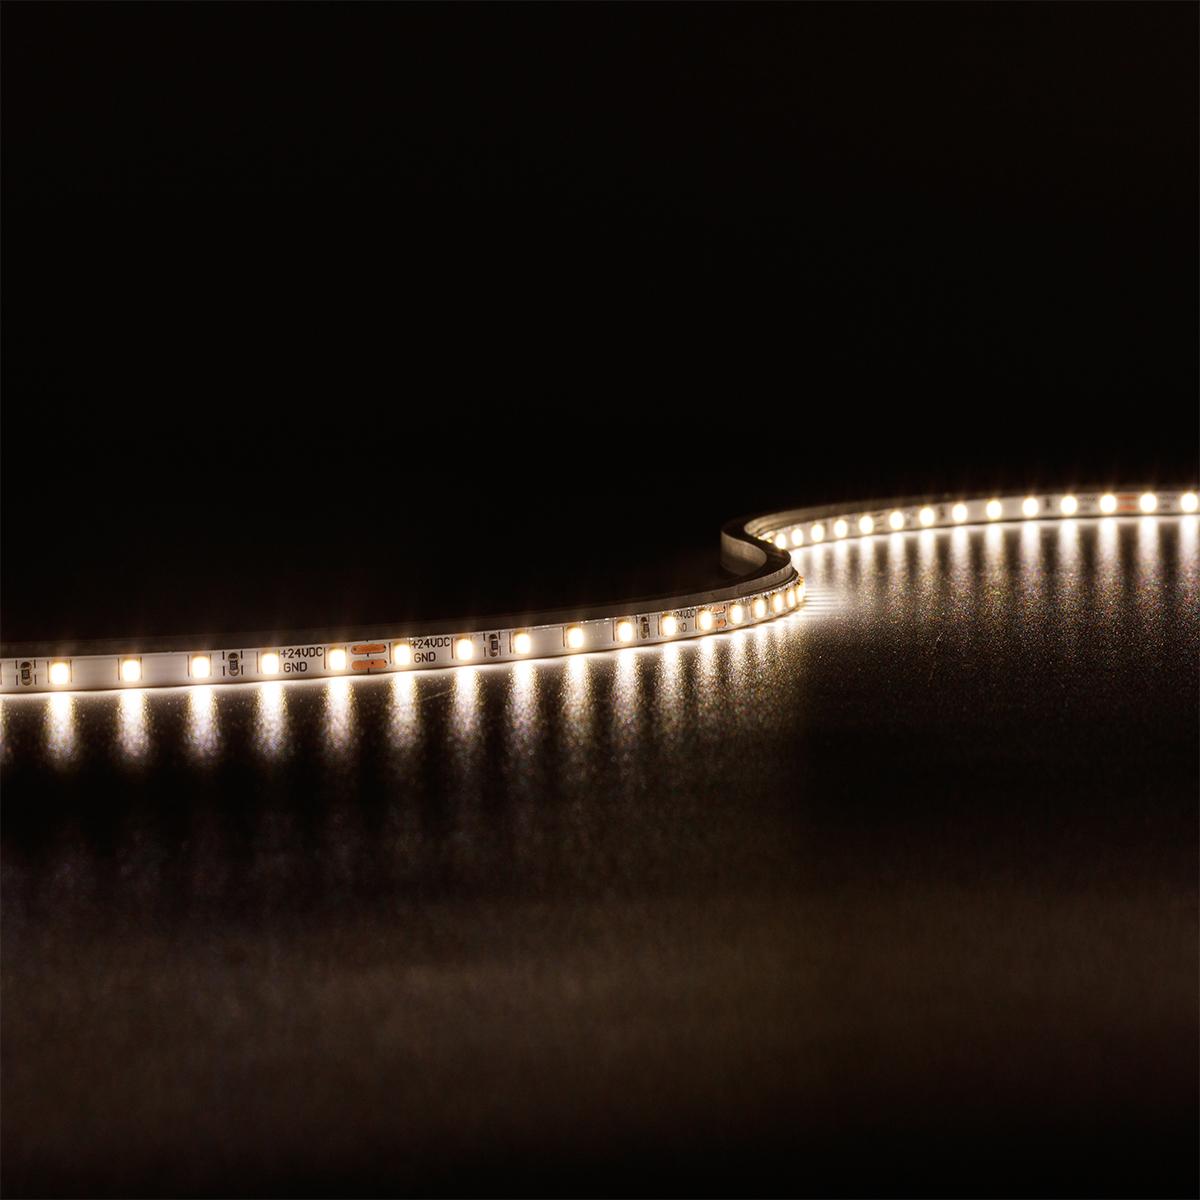 Strip Neutralweiß 24V CRI90 LED Streifen 5M 4W/m 140LED/m 3,5mm IP20 4000K